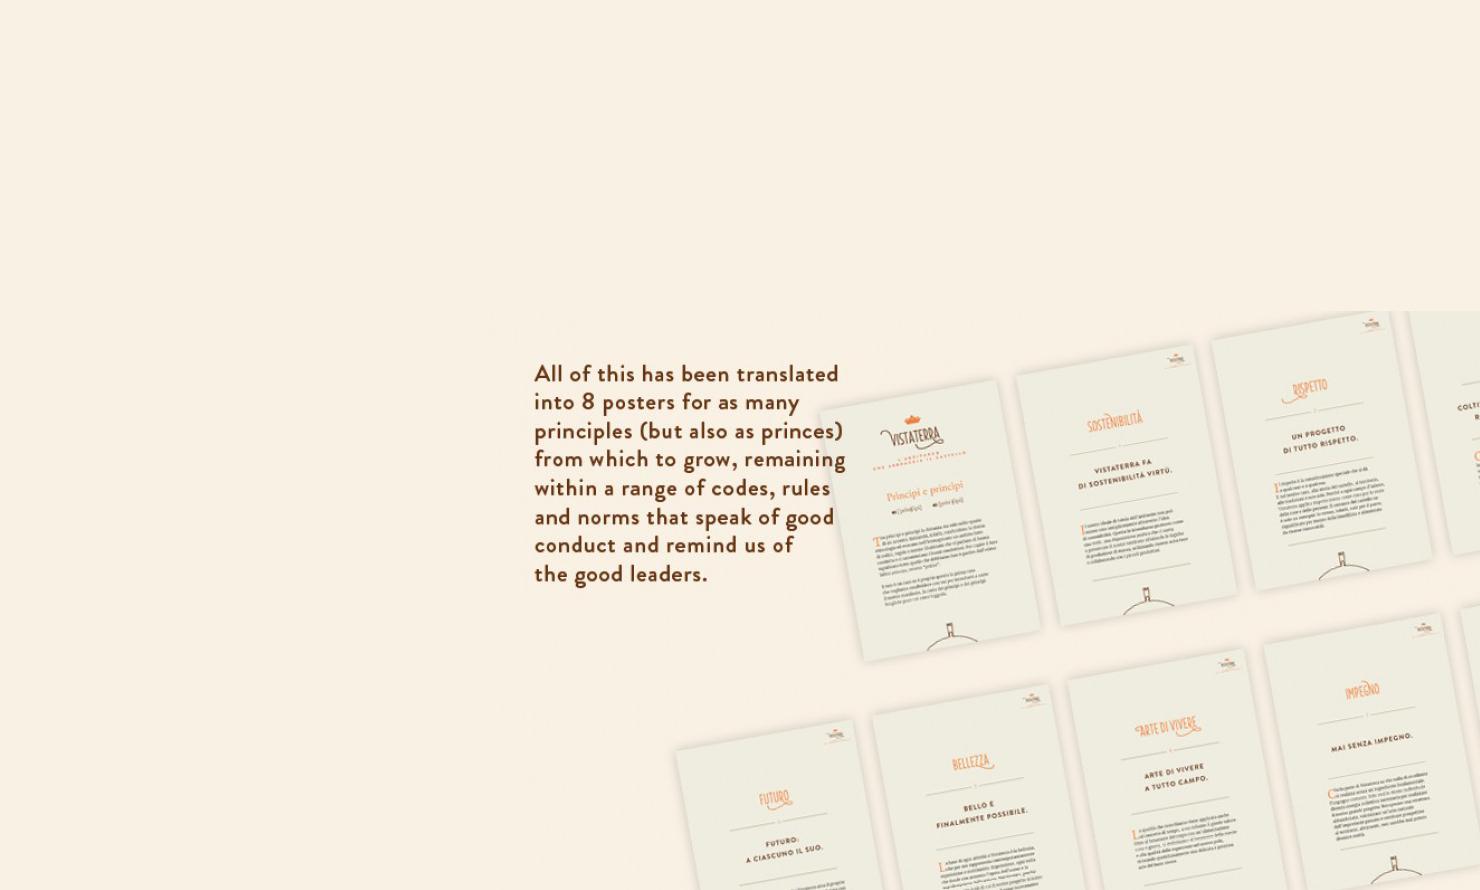 https://kubelibre.com/uploads/Slider-work-tutti-clienti/manital-vistaterra-l-agriparco-che-abbraccia-il-castello-brand-identity-brand-strategy-10.jpg